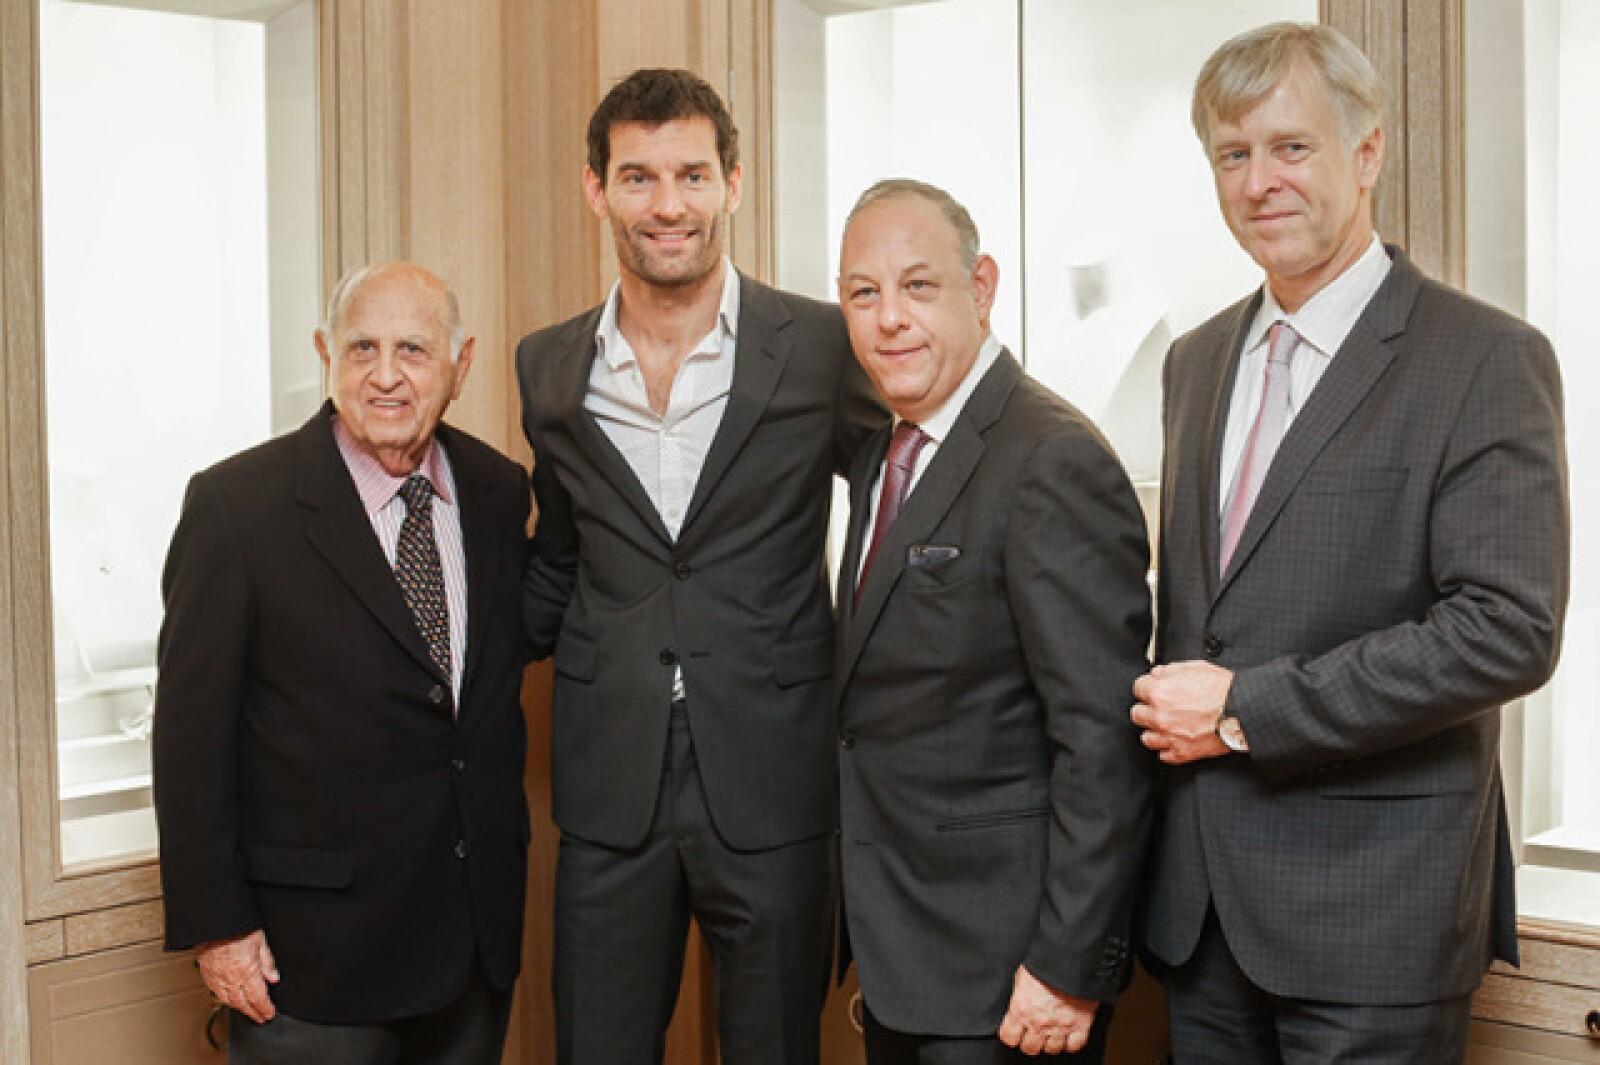 Mauricio Berger,Mark Webber,Ari Berger y Rudolph Lang